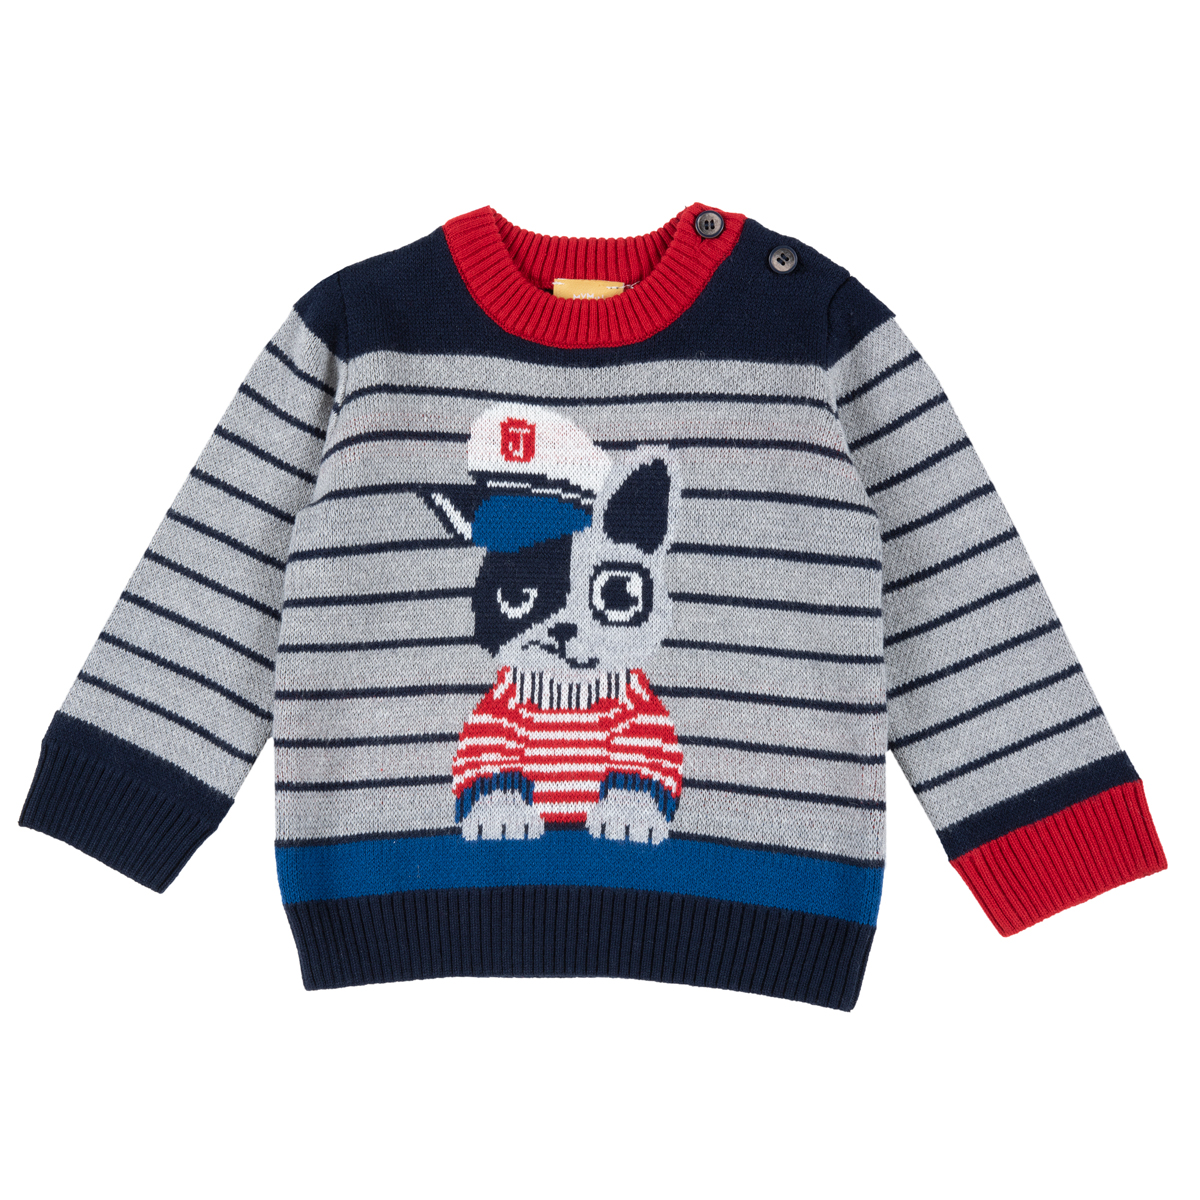 Pulover Cardigan Copii Chicco, Multicolor, 69444 imagine